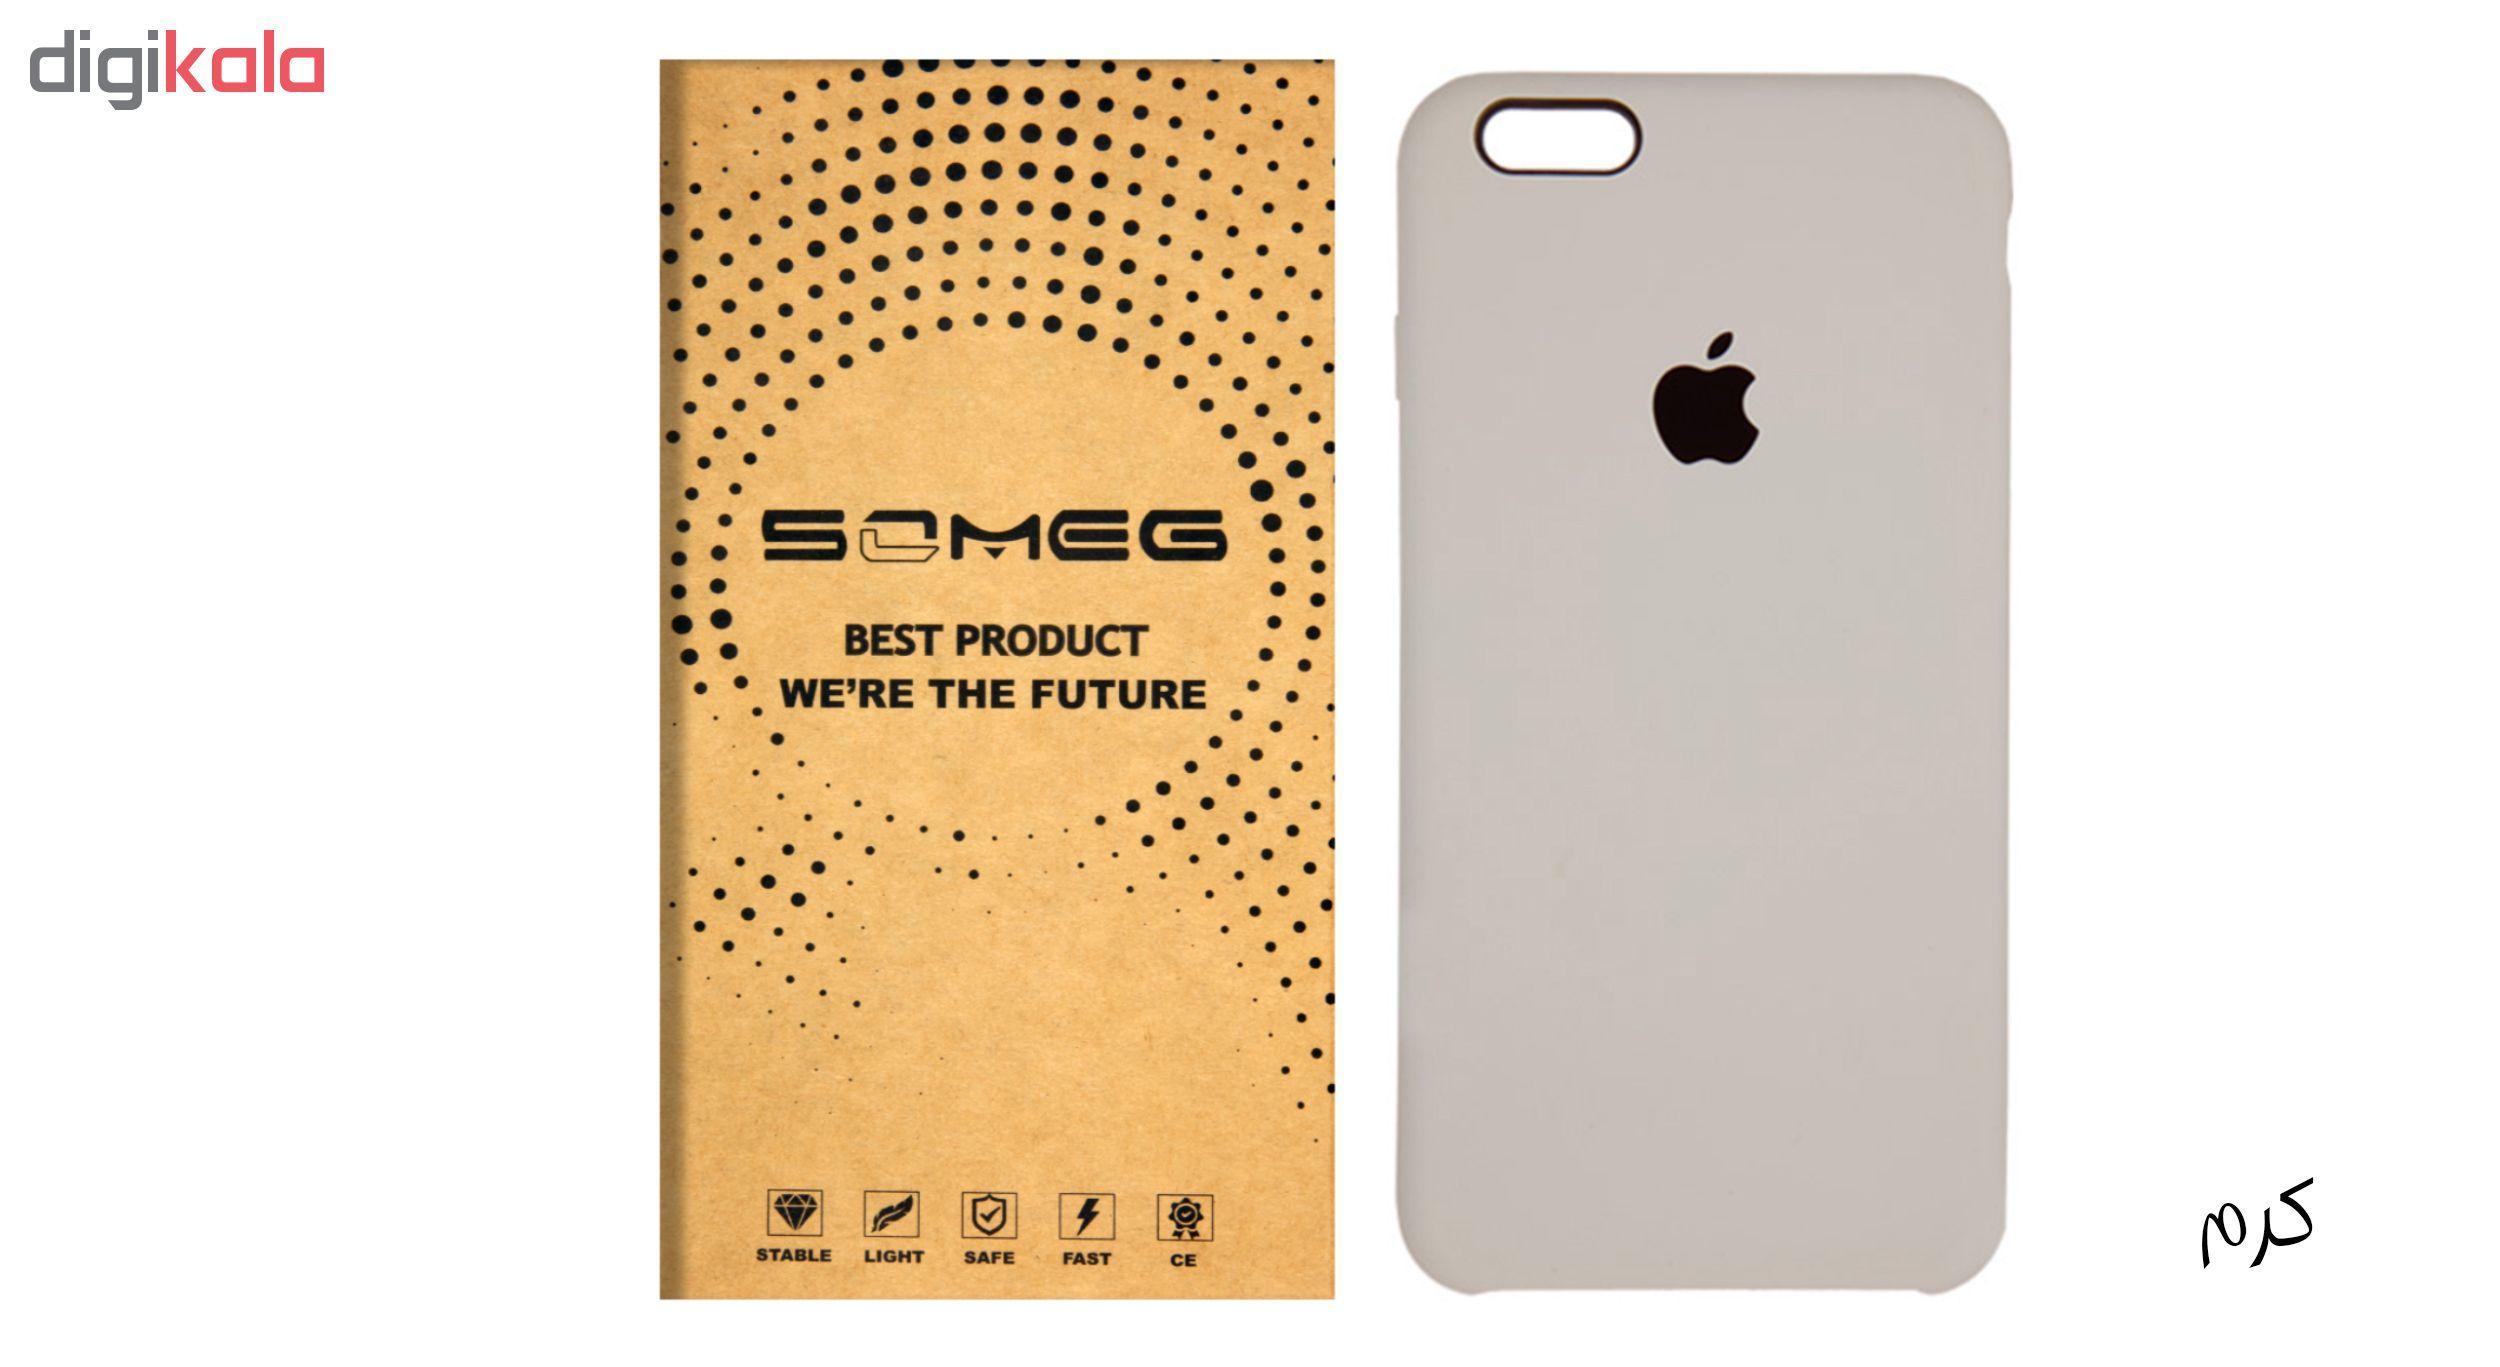 کاور سومگ مدل SIC مناسب برای گوشی موبایل اپل iPhone 6/6s main 1 33